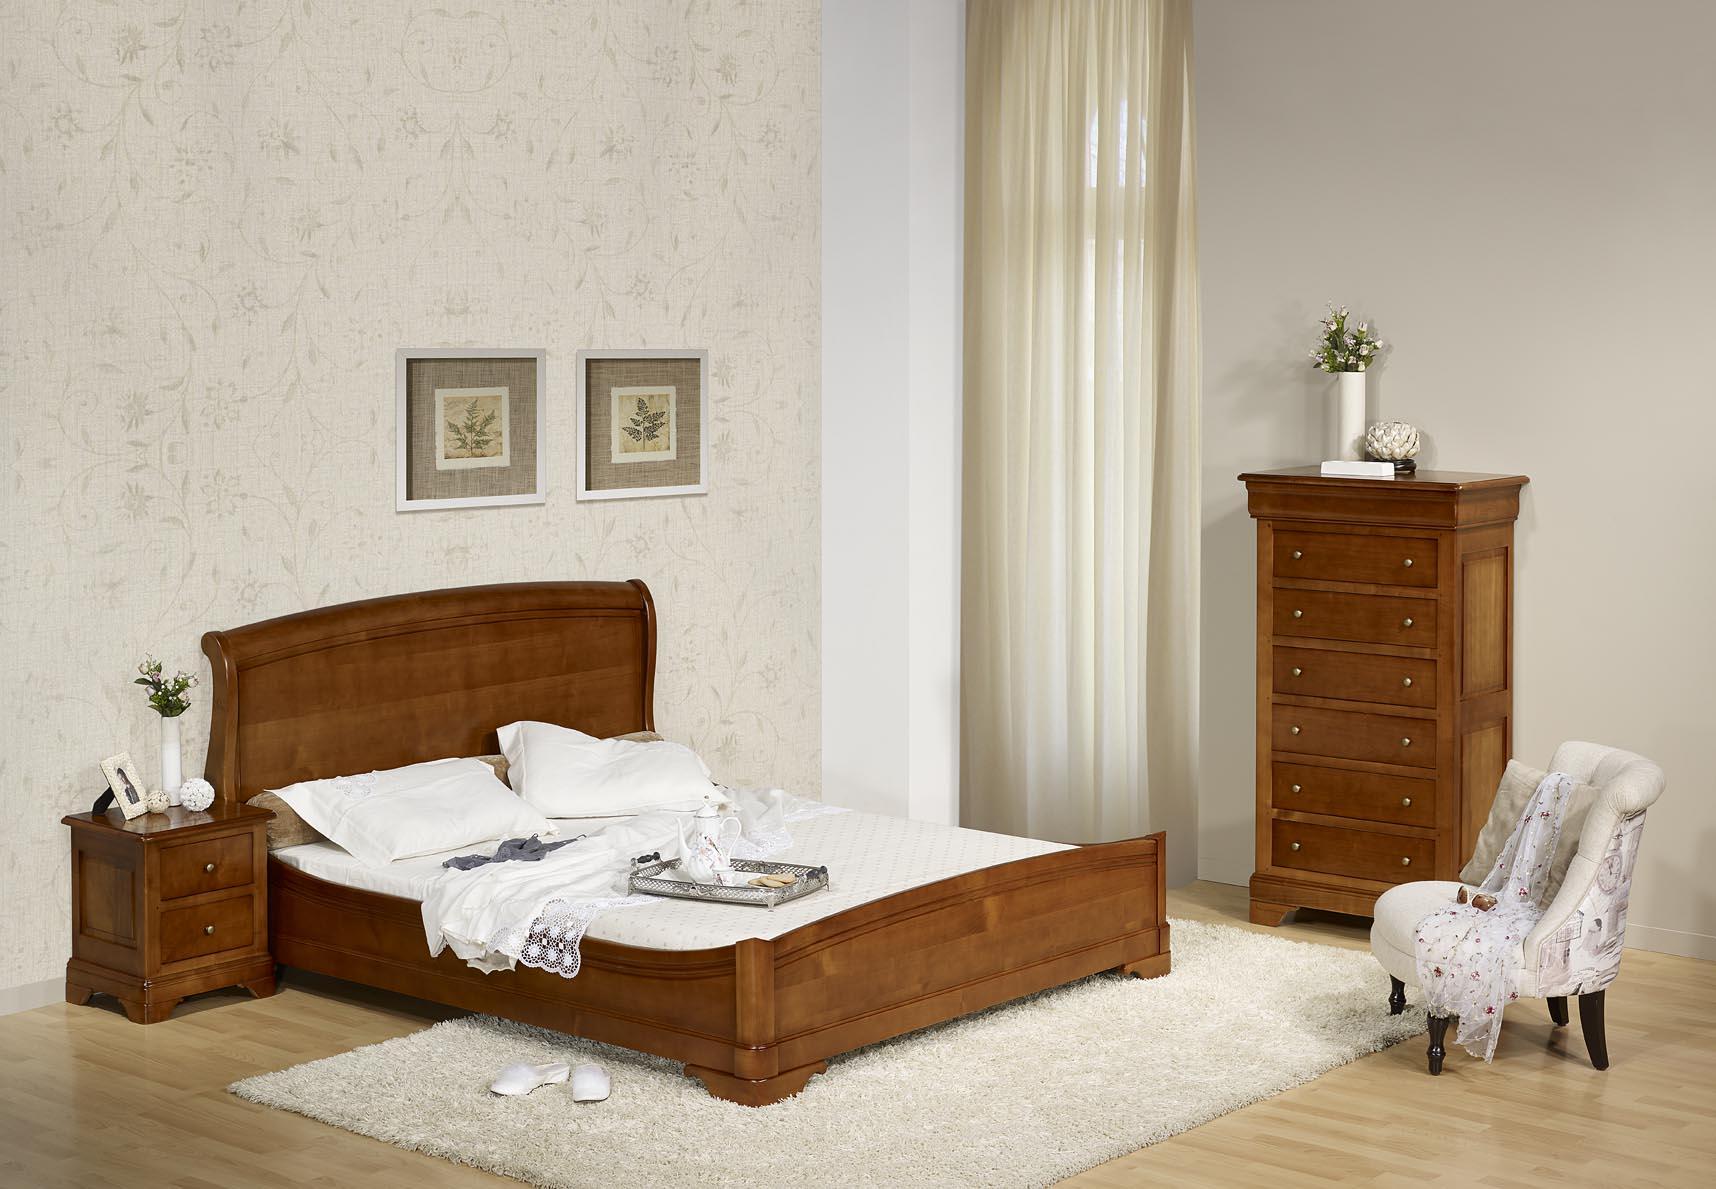 lit 160x200 en merisier massif de style louis philippe meuble en merisier massif. Black Bedroom Furniture Sets. Home Design Ideas